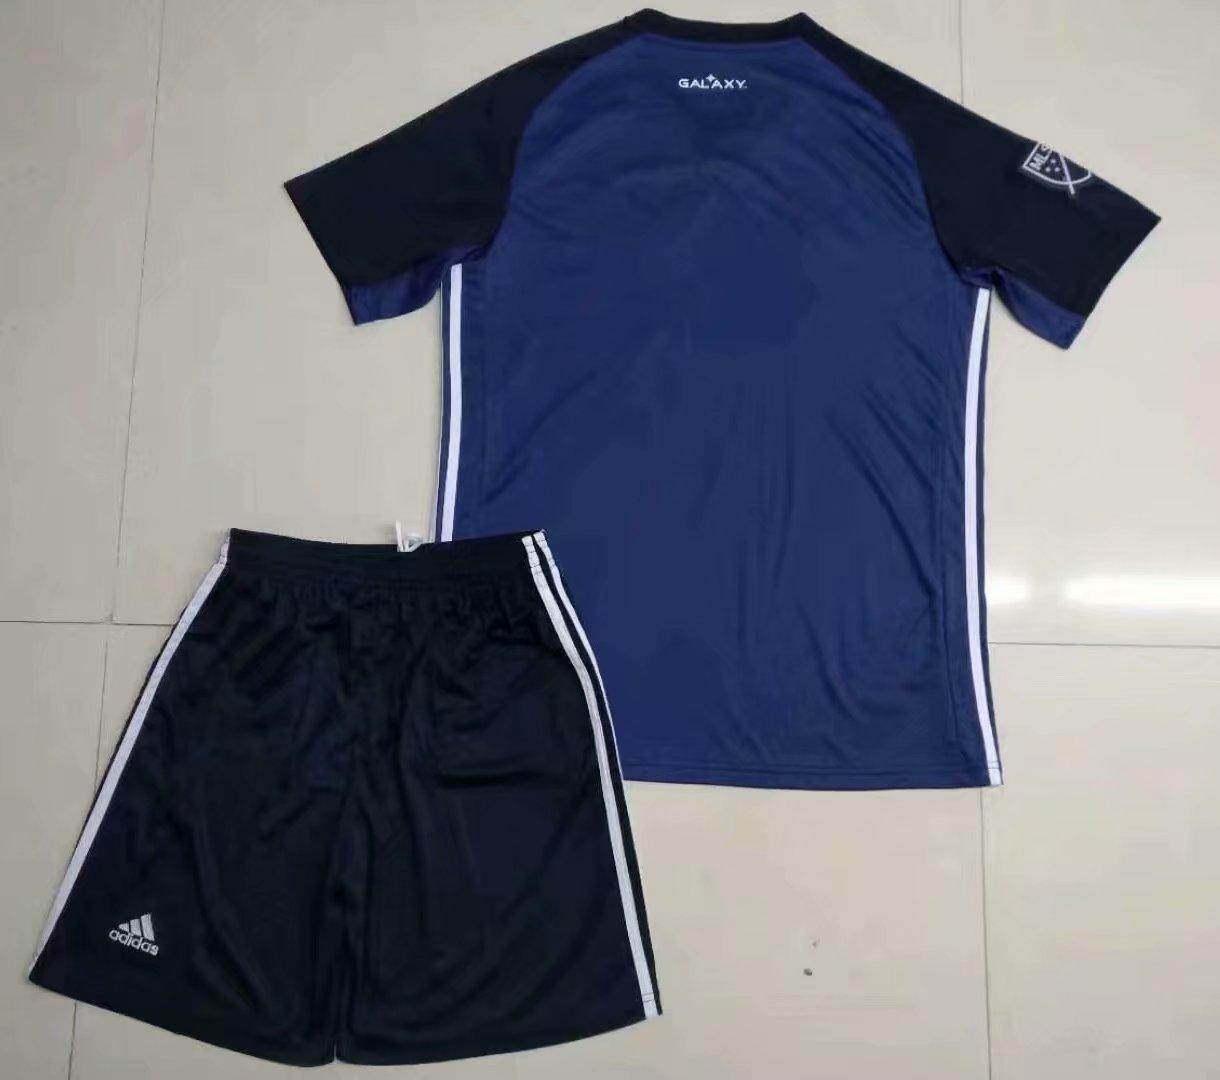 e90a02128 19-20 Adult LA Galaxy Away Soccer Jersey Football Uniforms Blue Soccer Kits  Item NO  577648